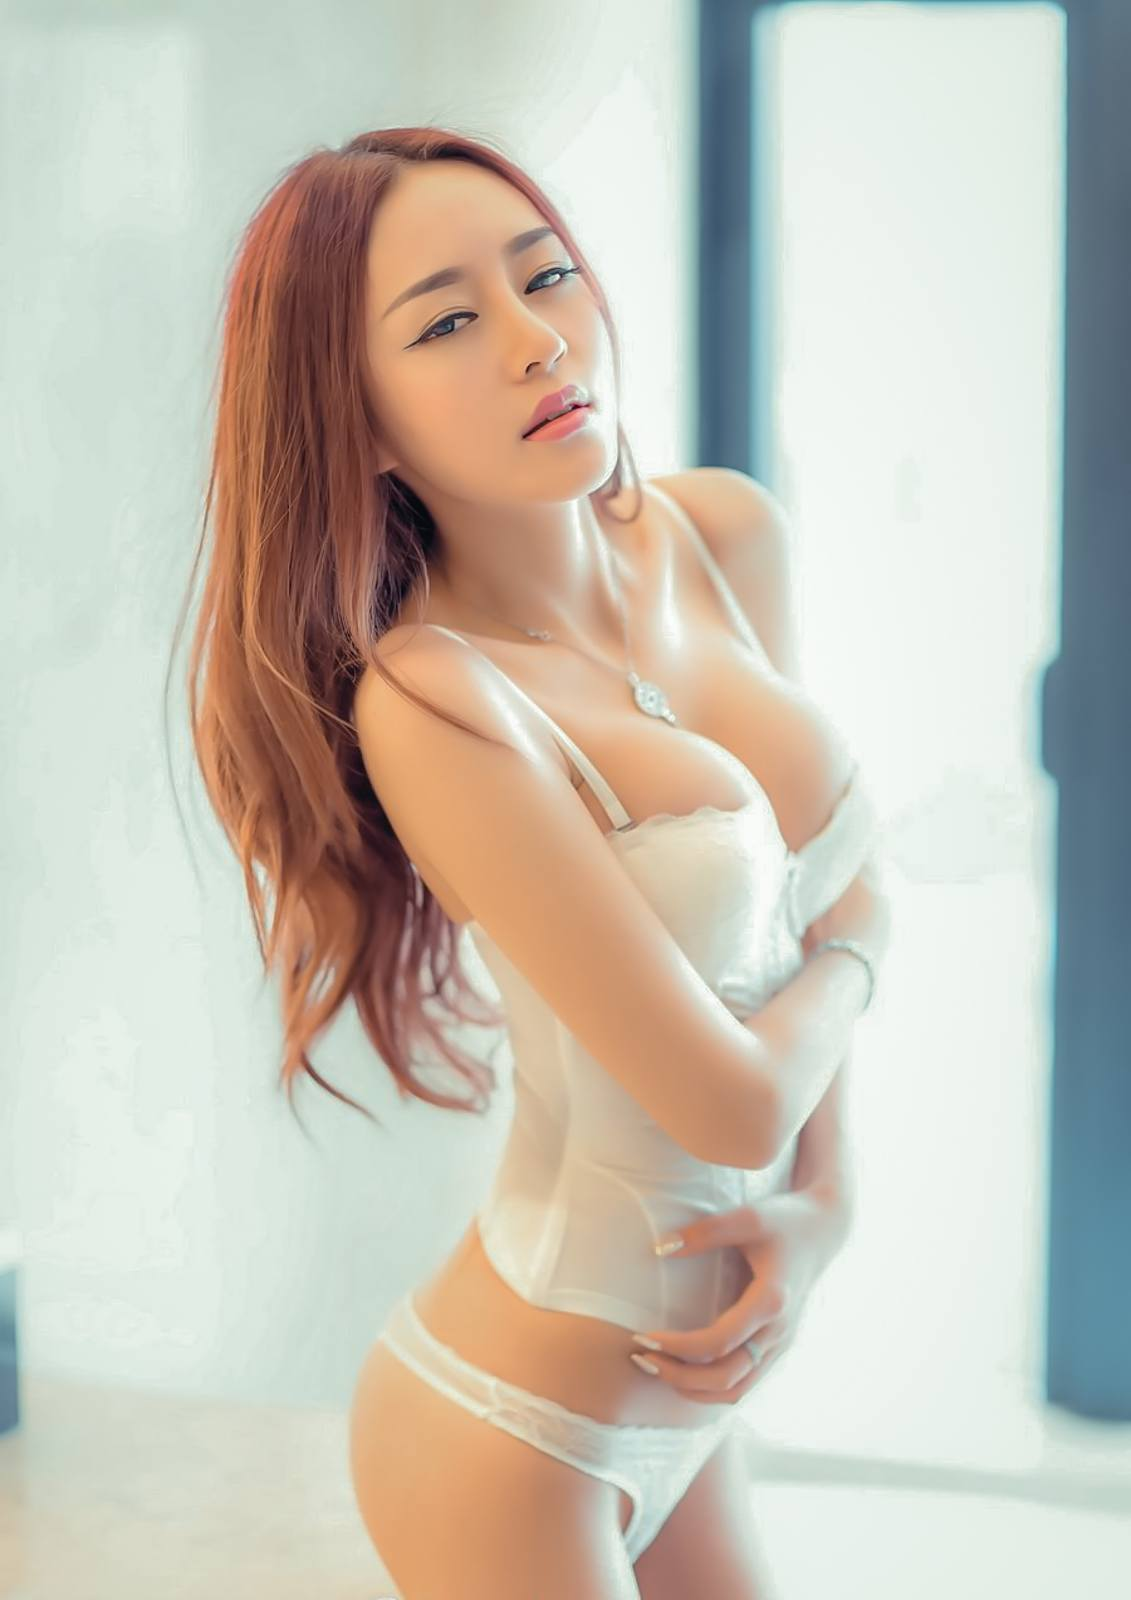 Mi%2BYeon%2BLee%2B%25E6%259D%258E%25E7%25BE%258E%25E5%25A6%258D%2B %2BBubbles Covered%2BNude%2BOutdoors%2B %2B007 - Korean Nude - Big Albom Remain #A-korean girl